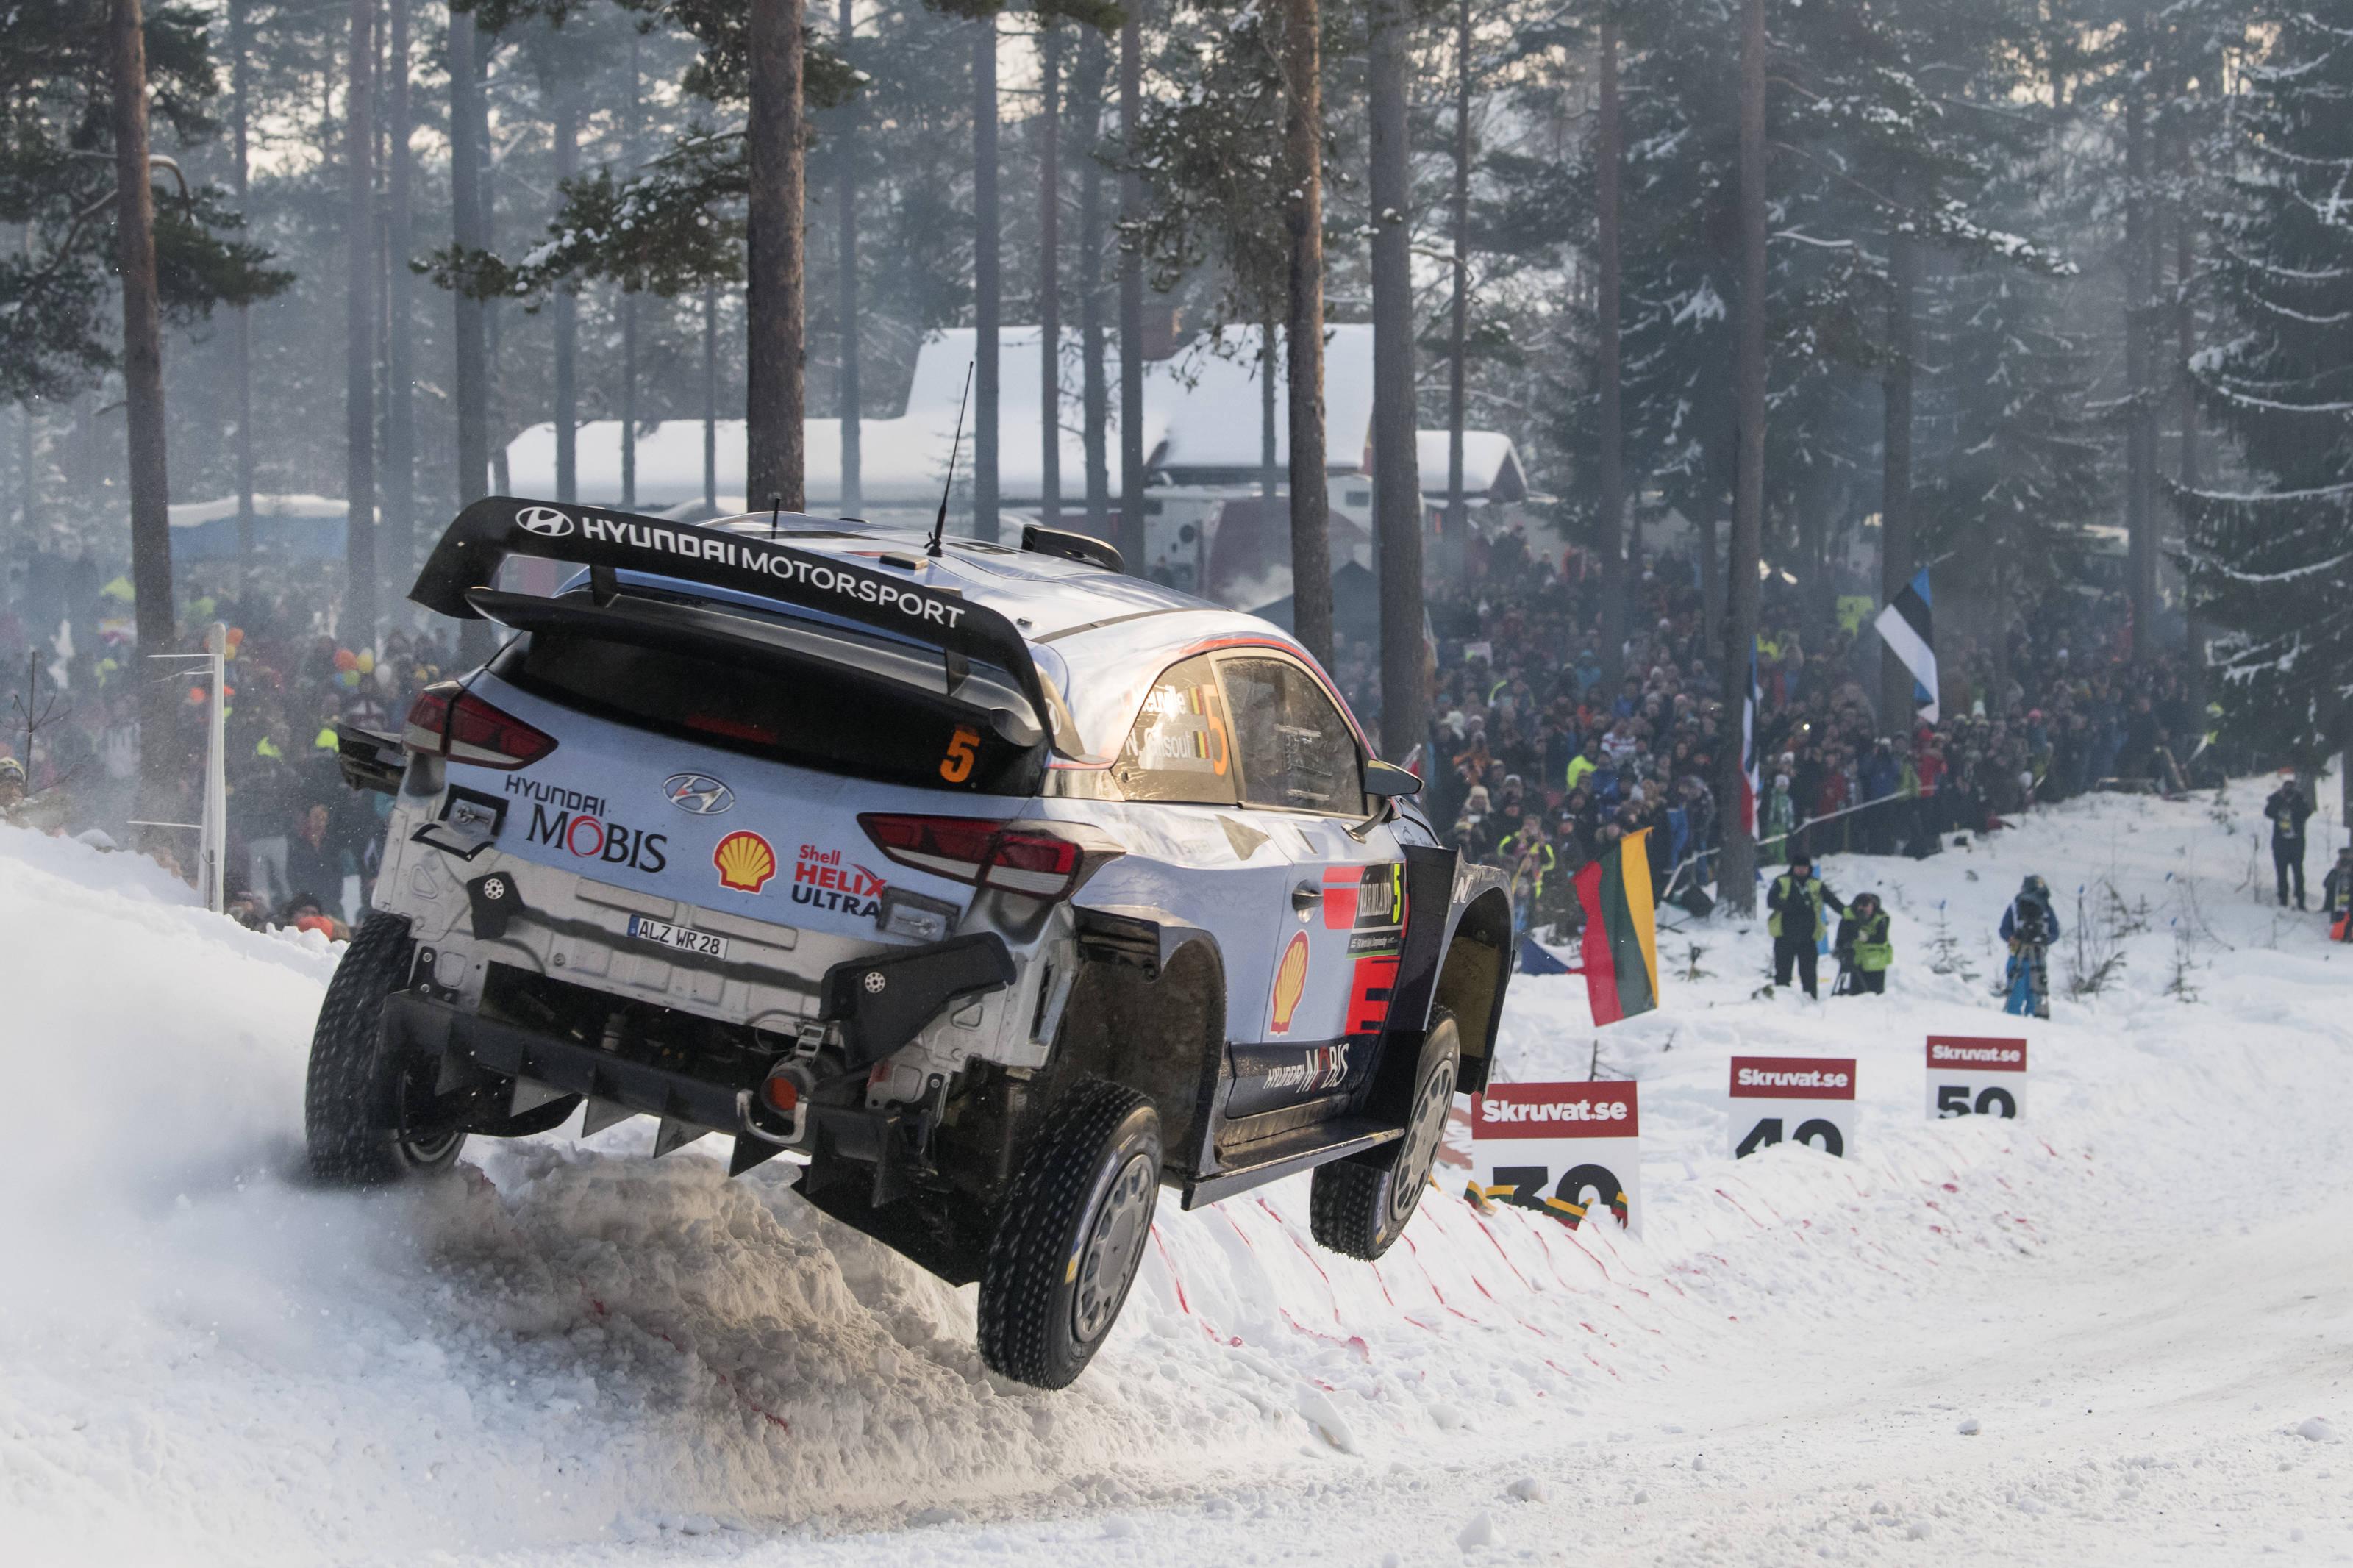 http://www.autosport.bg/wp-content/uploads/2018/02/AP-1UT1GFXH52111_news.jpg